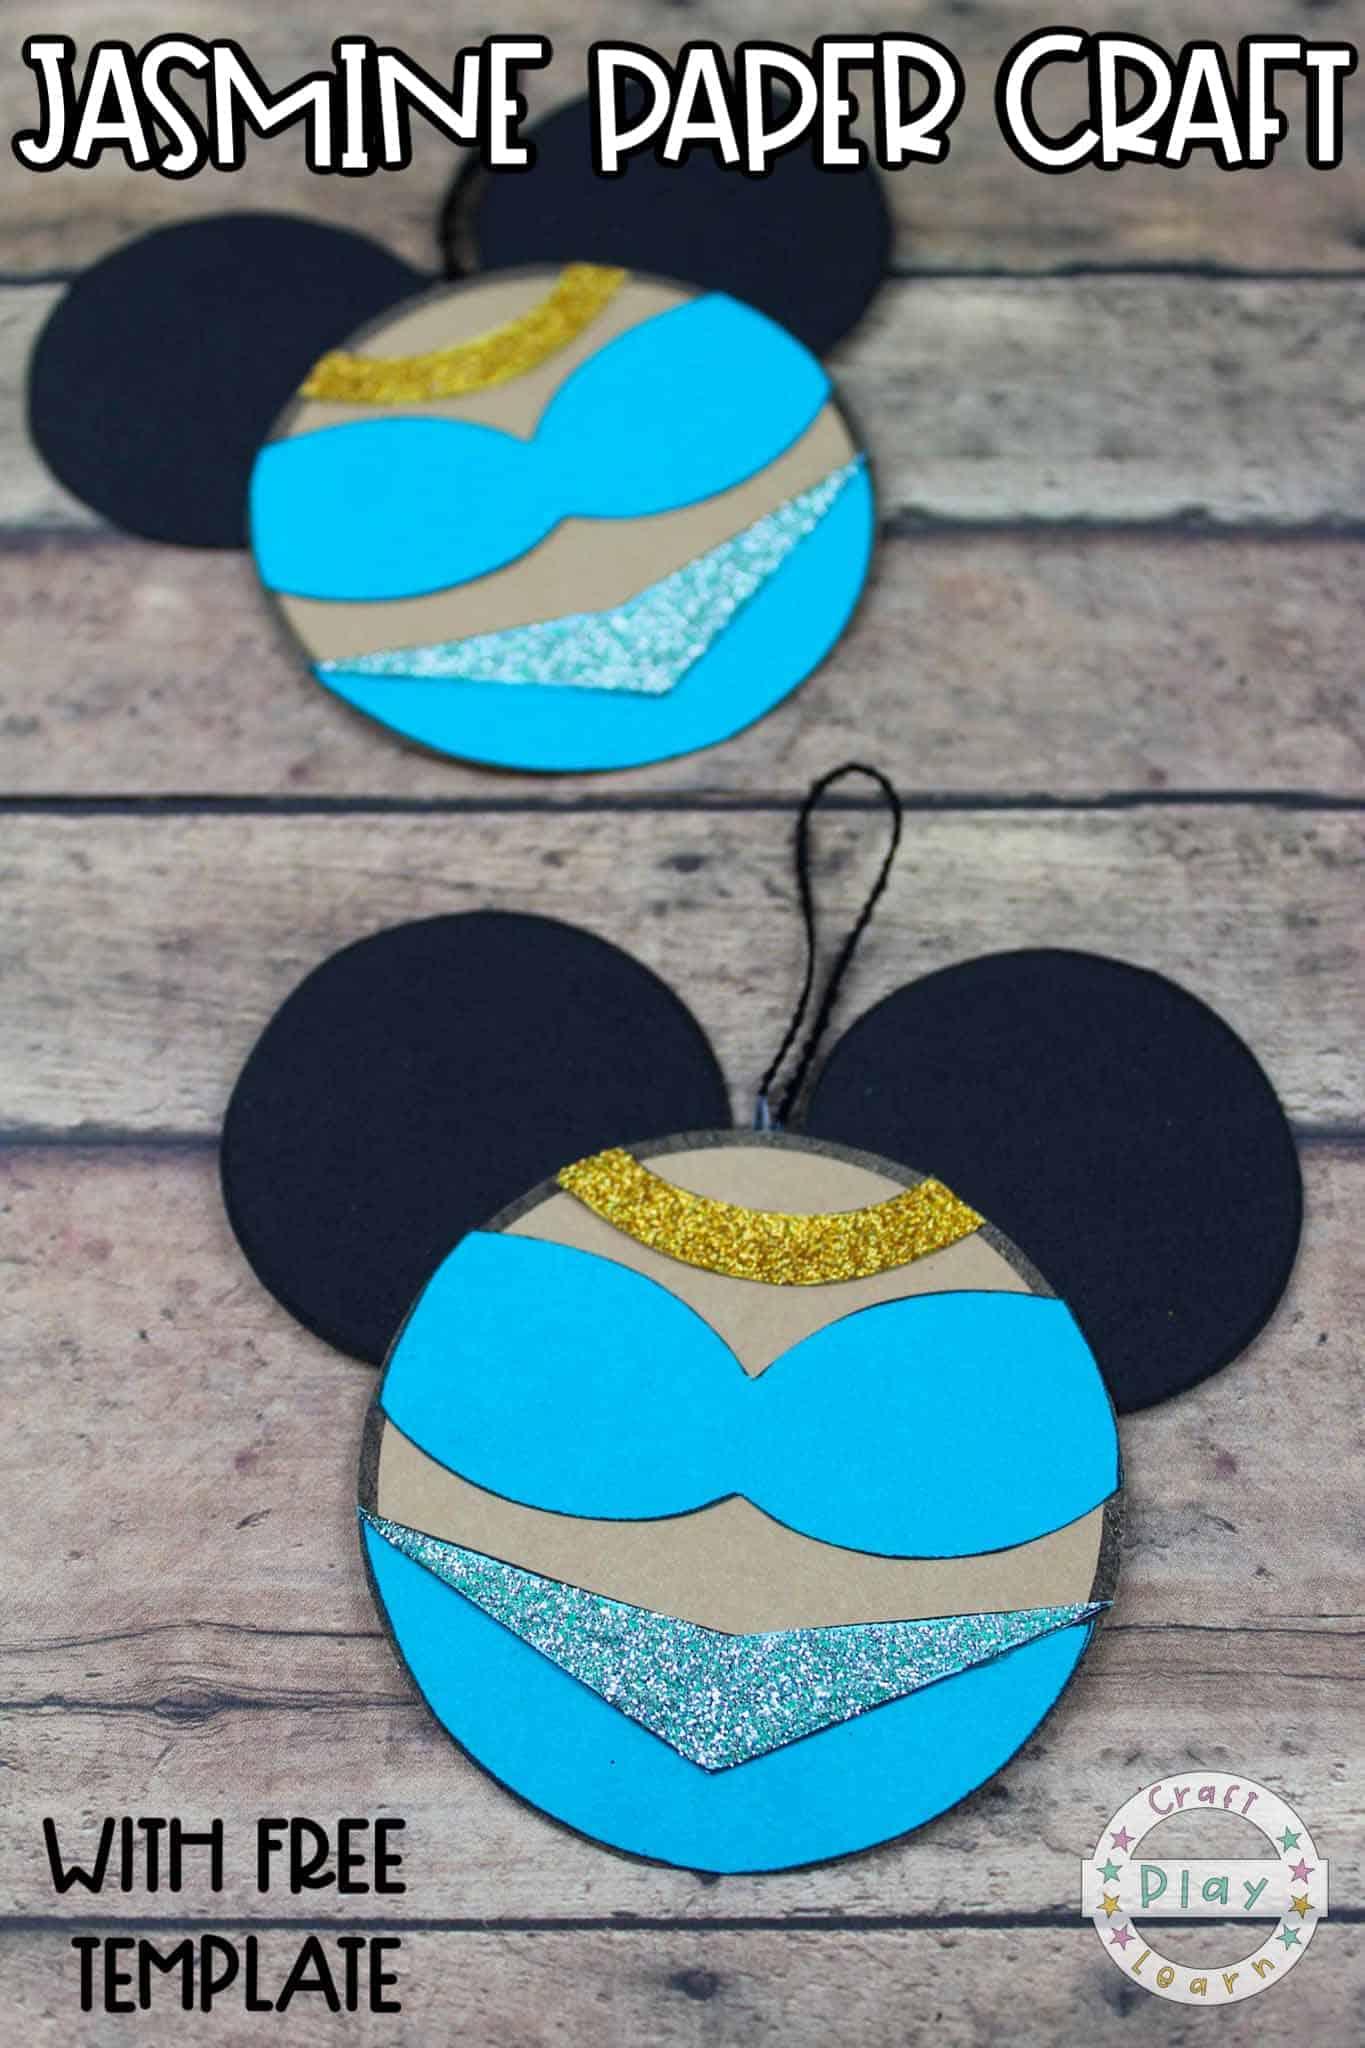 princess jasmine paper craft